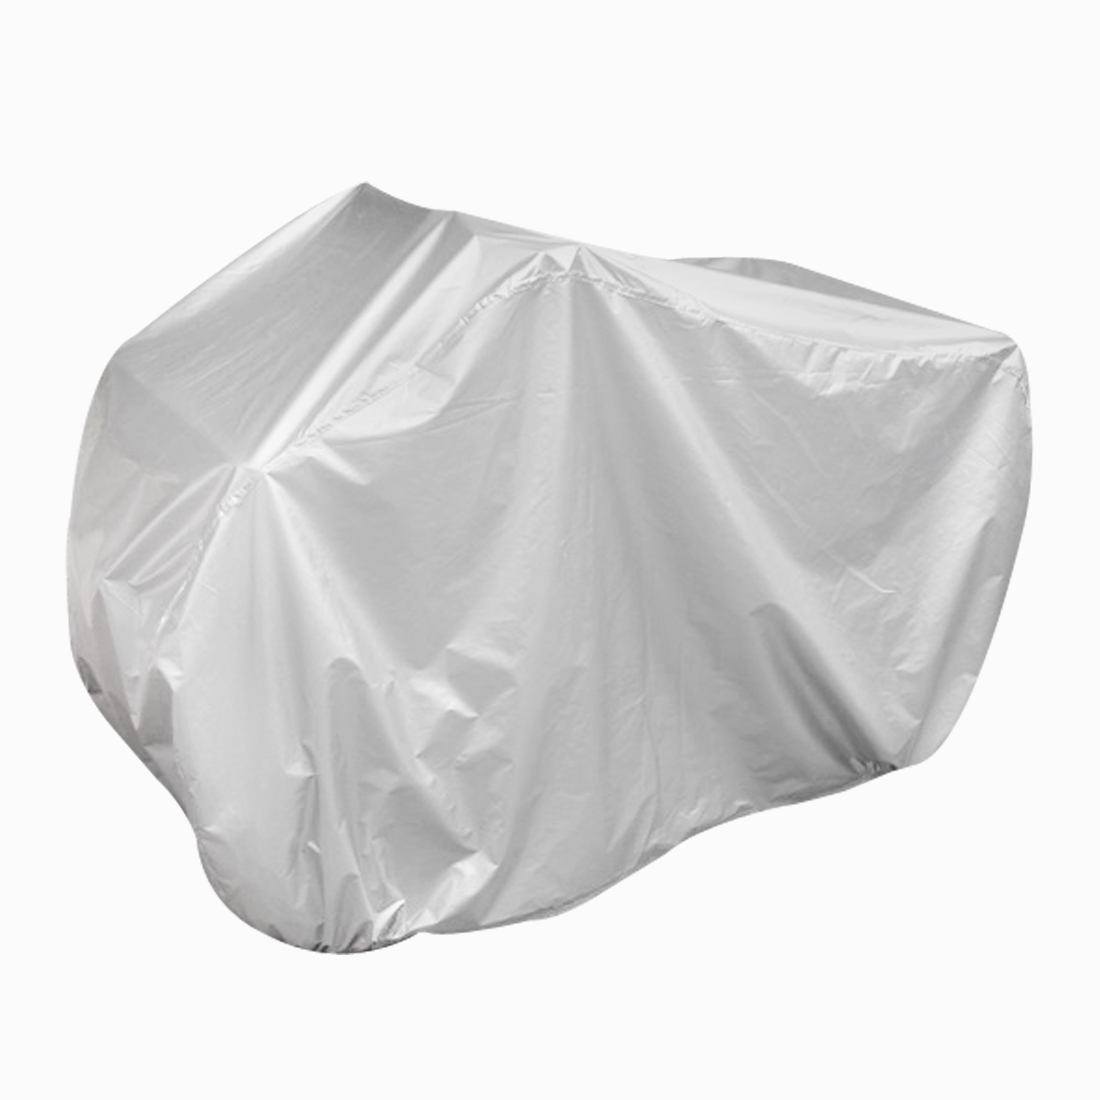 Silver Tone Rain Water Resistant Protective Quad Bike ATV Cover 220x98x106cm